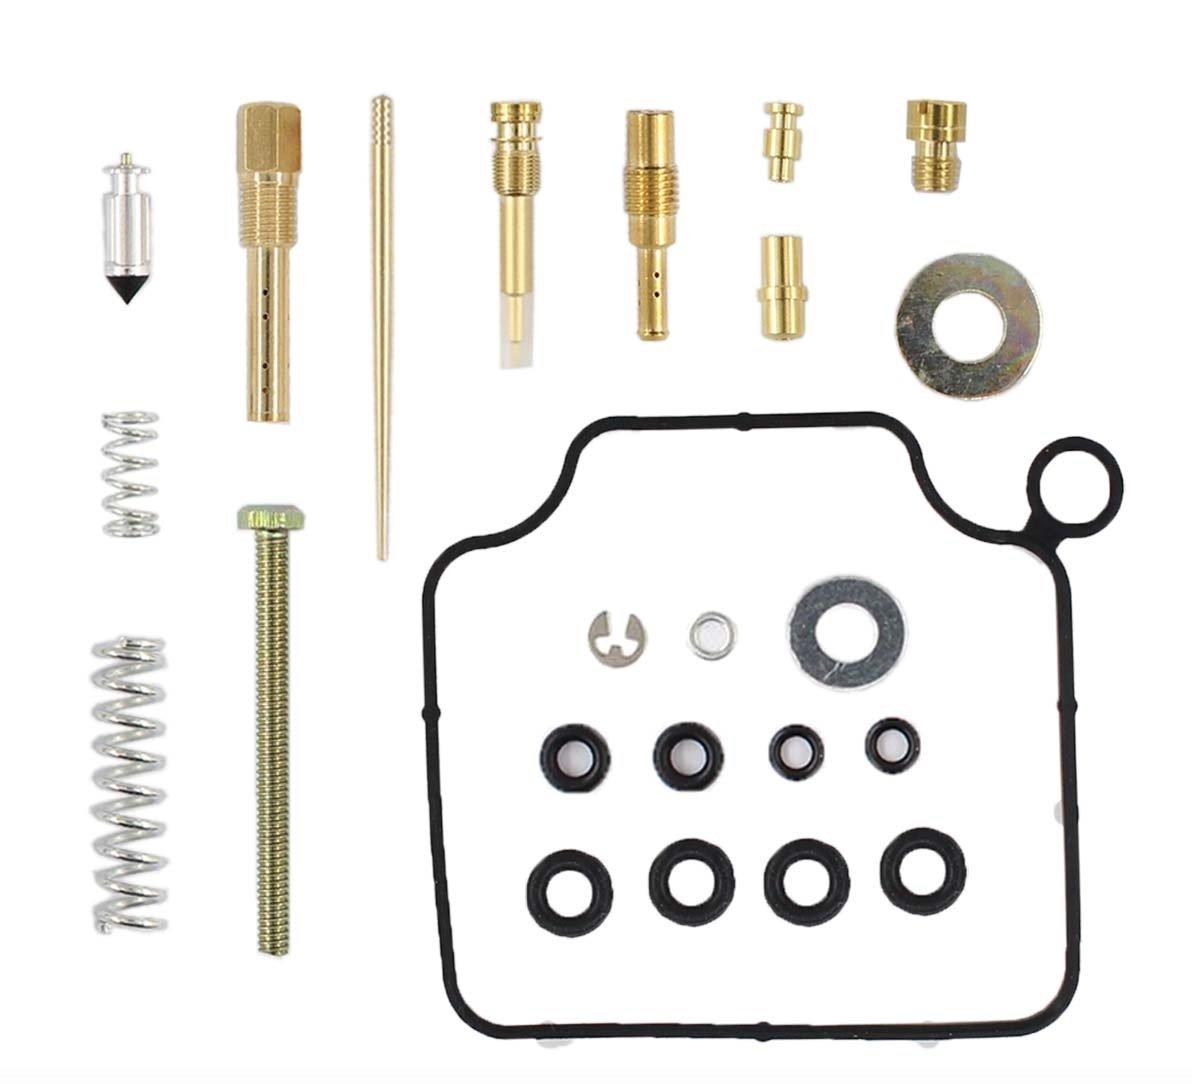 Carburetor Rebuild Kit Repair Compatible With Honda TRX350 Rancher 350 2004 2005 2006 Carb MOTOKU